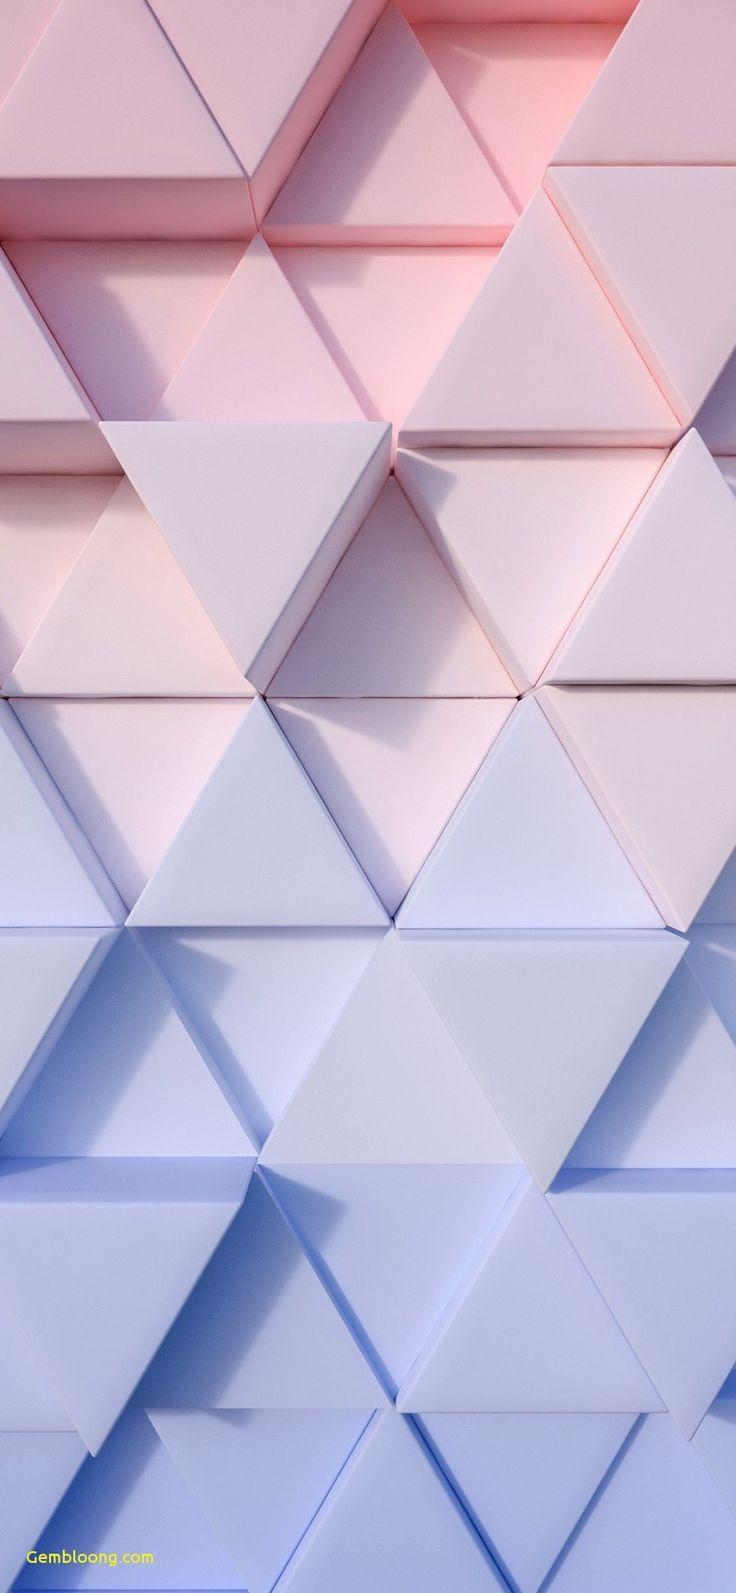 Iphone X Wallpaper Unicorn Fresh Launcher 3d Wallpaper New Amazing Holographic Wallpaper Pretty Wallpaper Iphone Pastel Iphone Wallpaper Iphone Wallpaper Girly